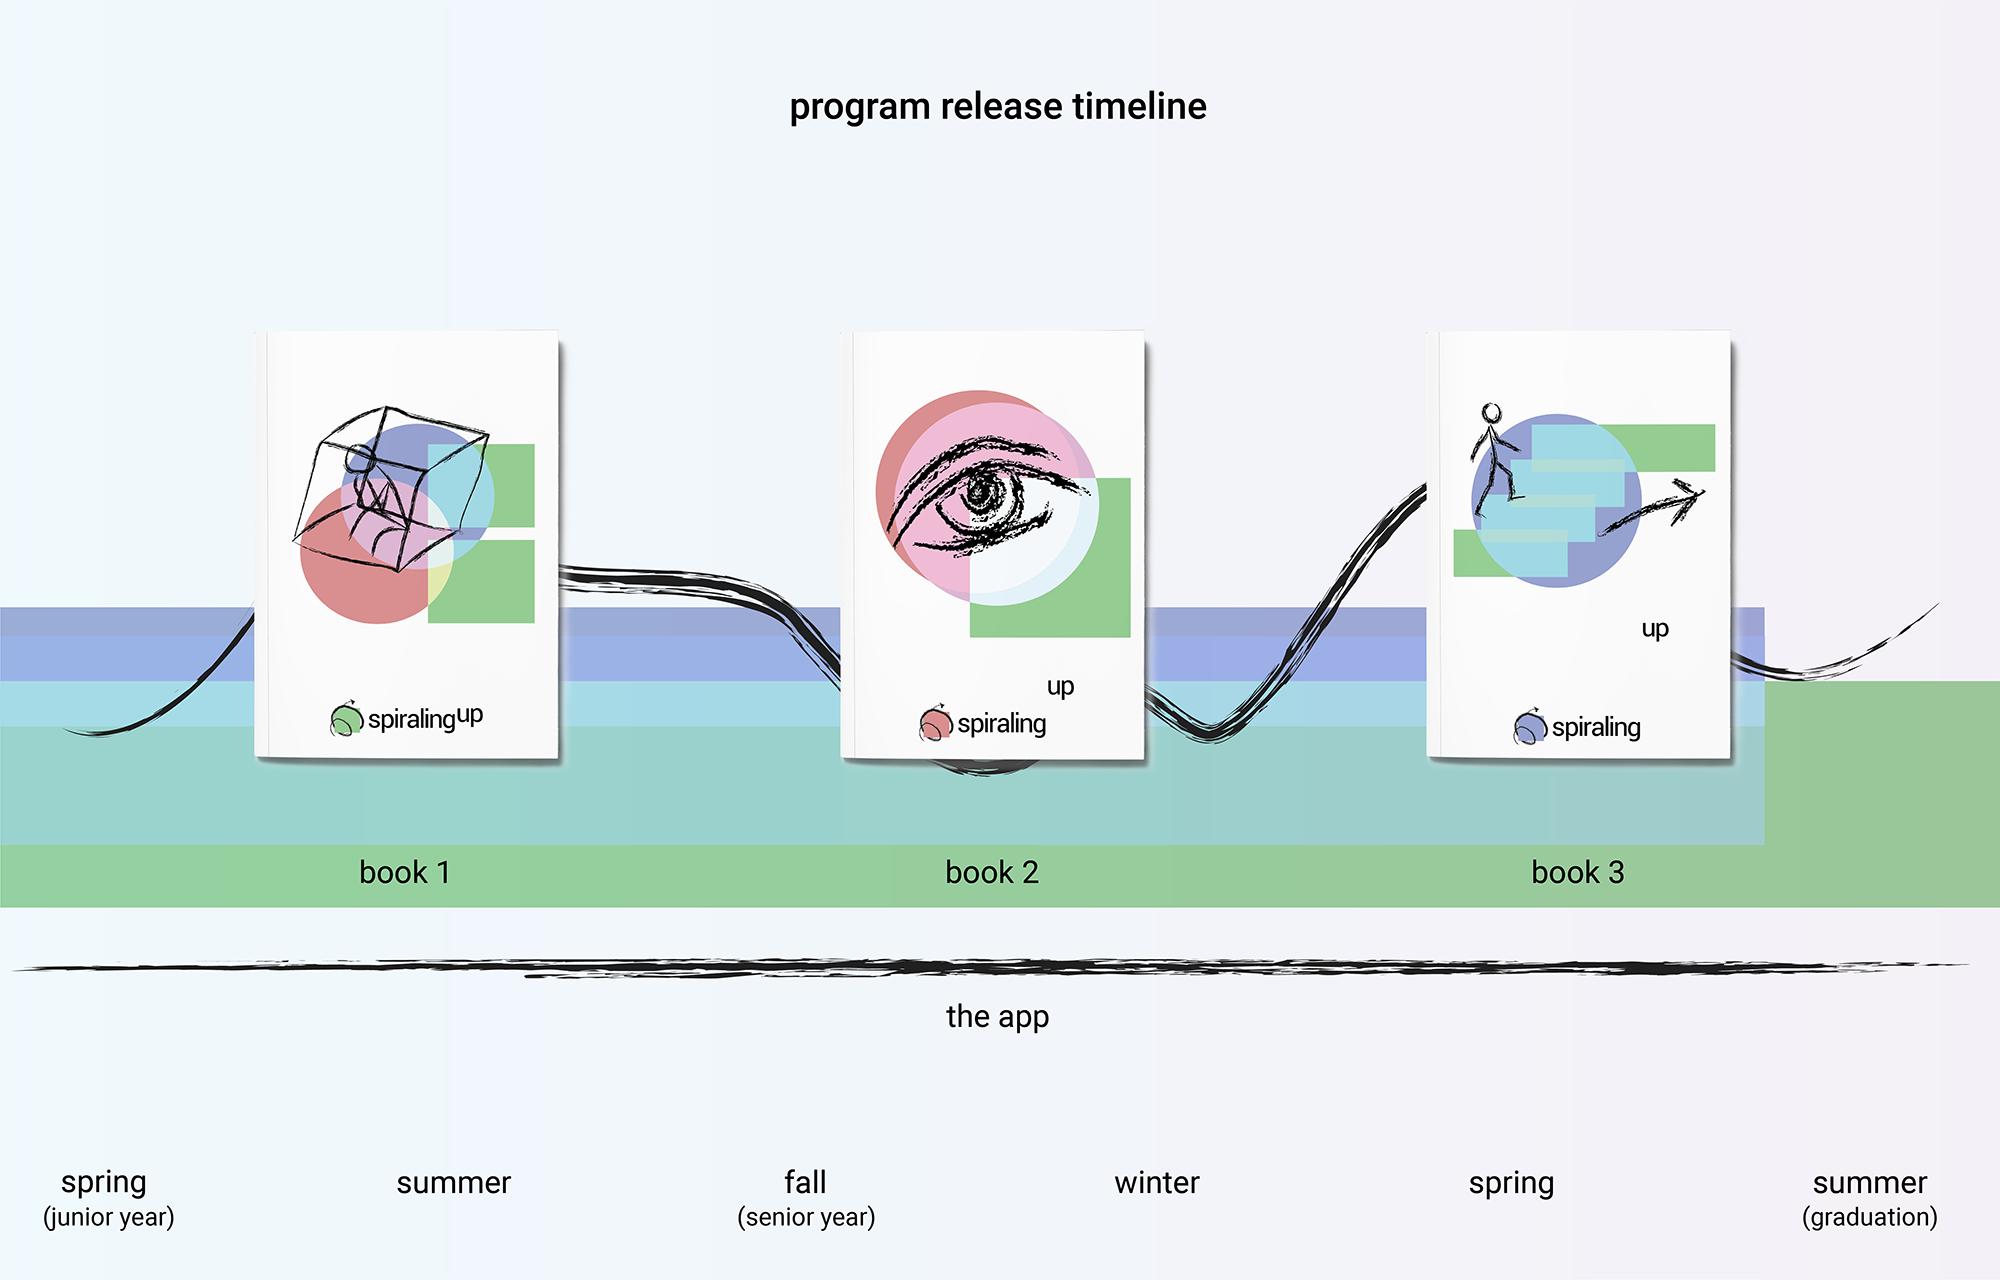 spiralup_program-02.png